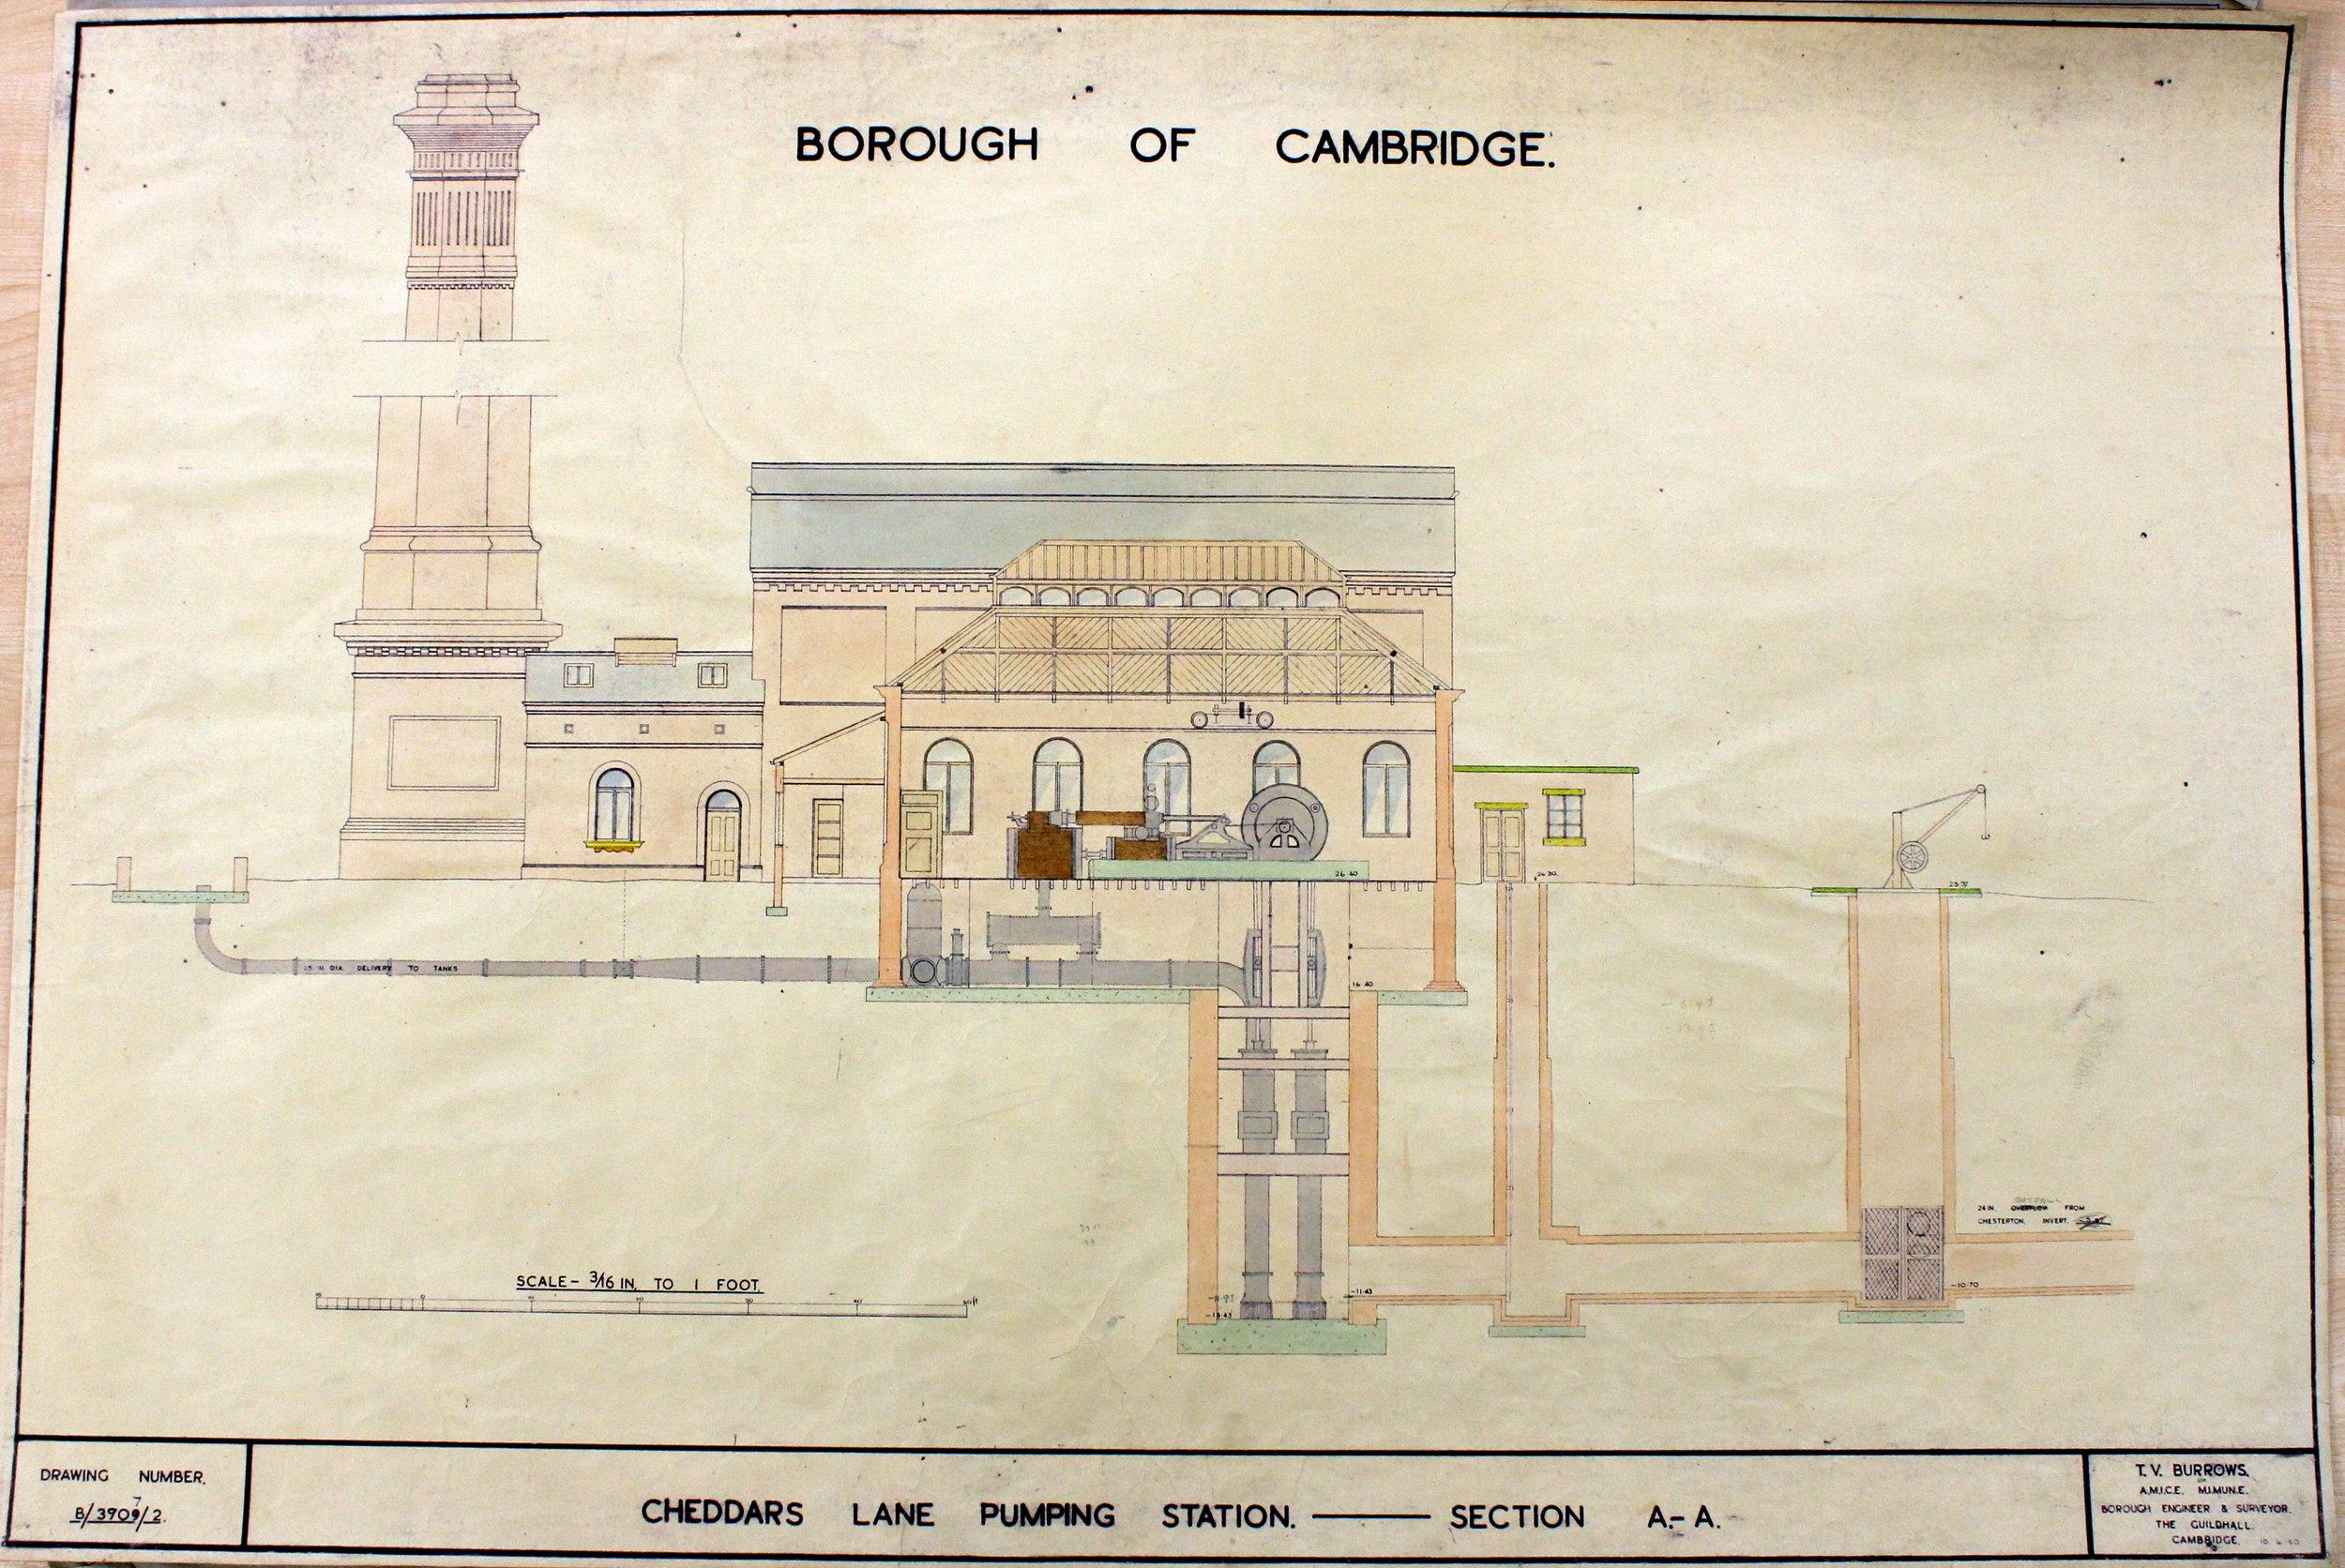 Borough_of_Cambridge_pumping_station_A-A_section_original_architectsplans.JPG